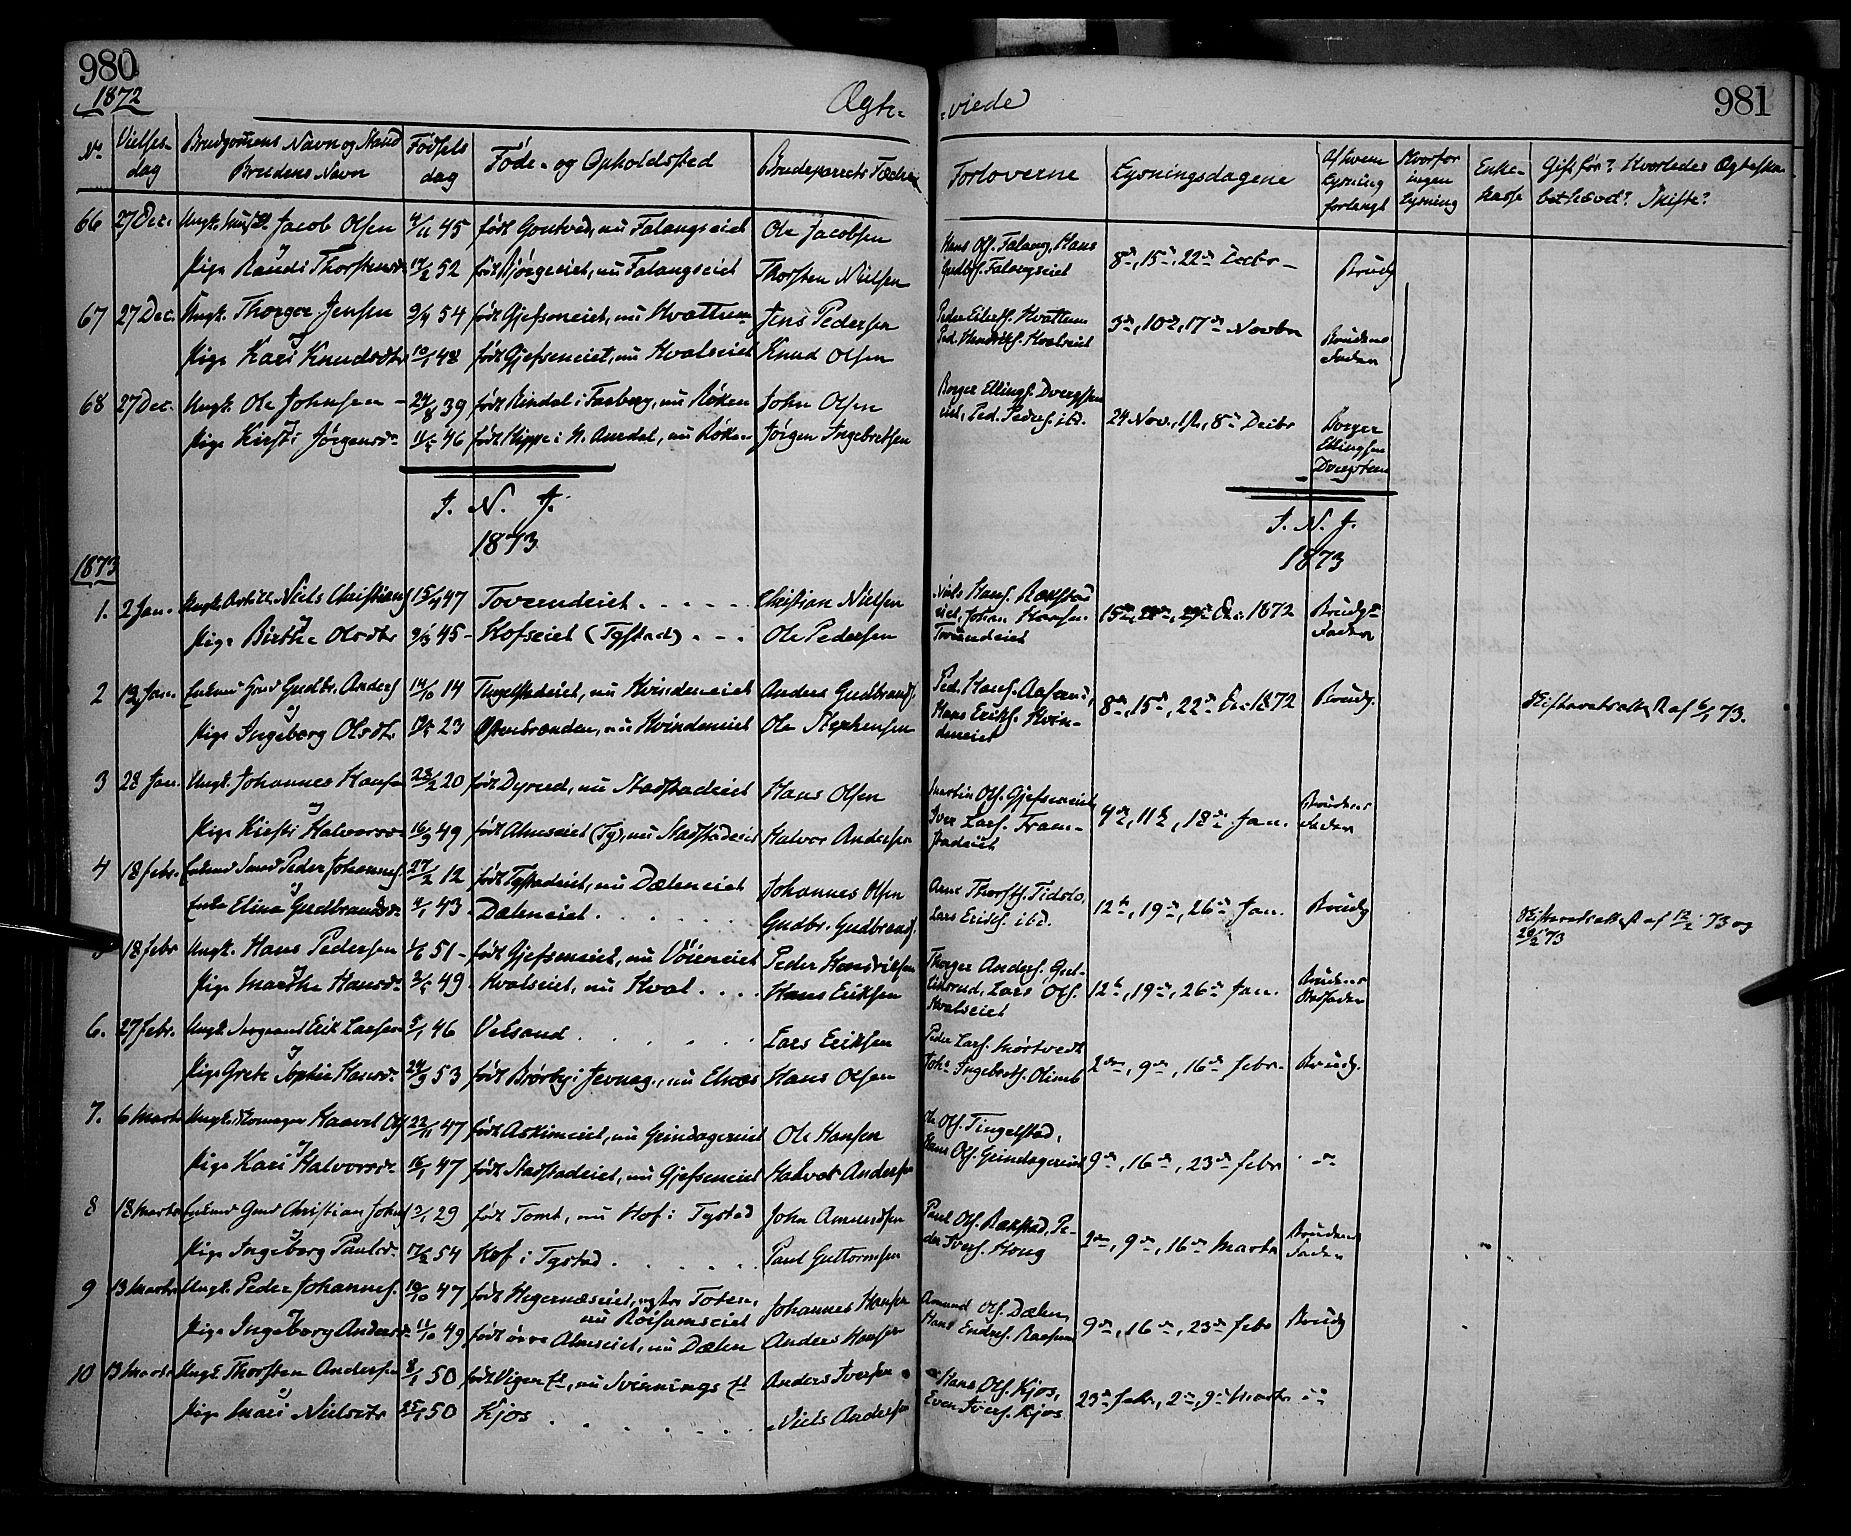 SAH, Gran prestekontor, Ministerialbok nr. 12, 1856-1874, s. 980-981